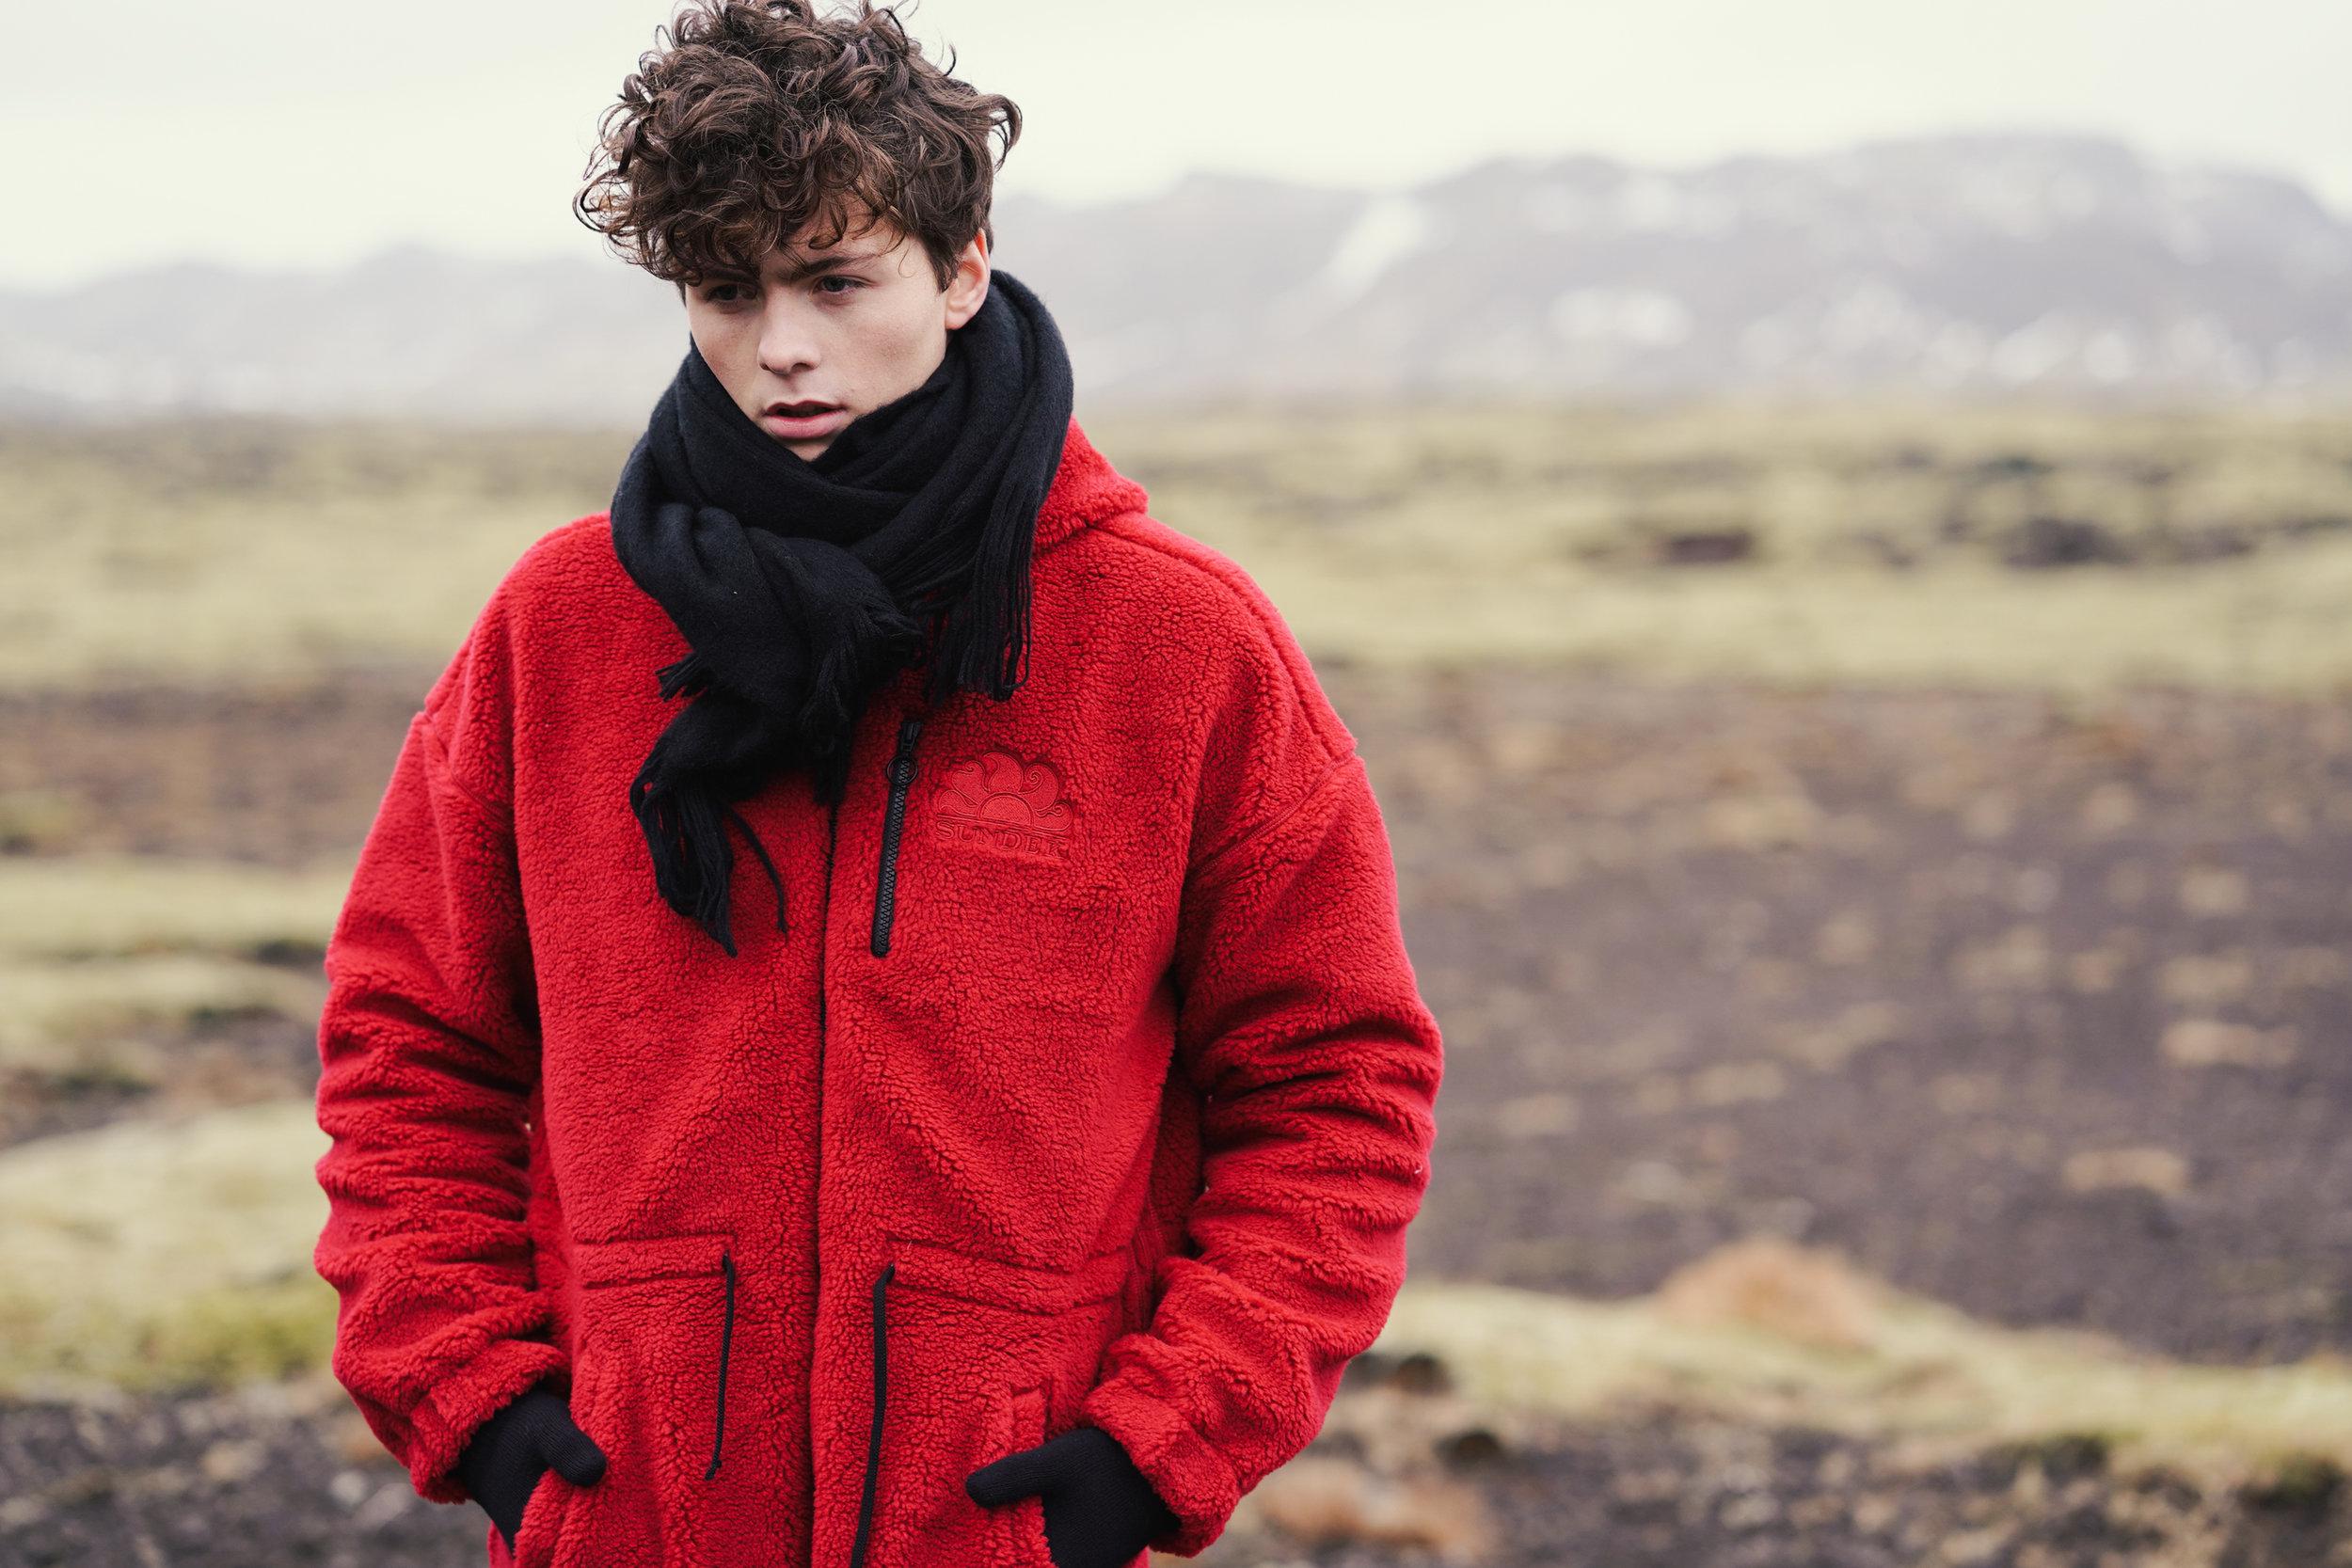 Sundek photoshoot Solon wearing red long jacket at Reykjarnes